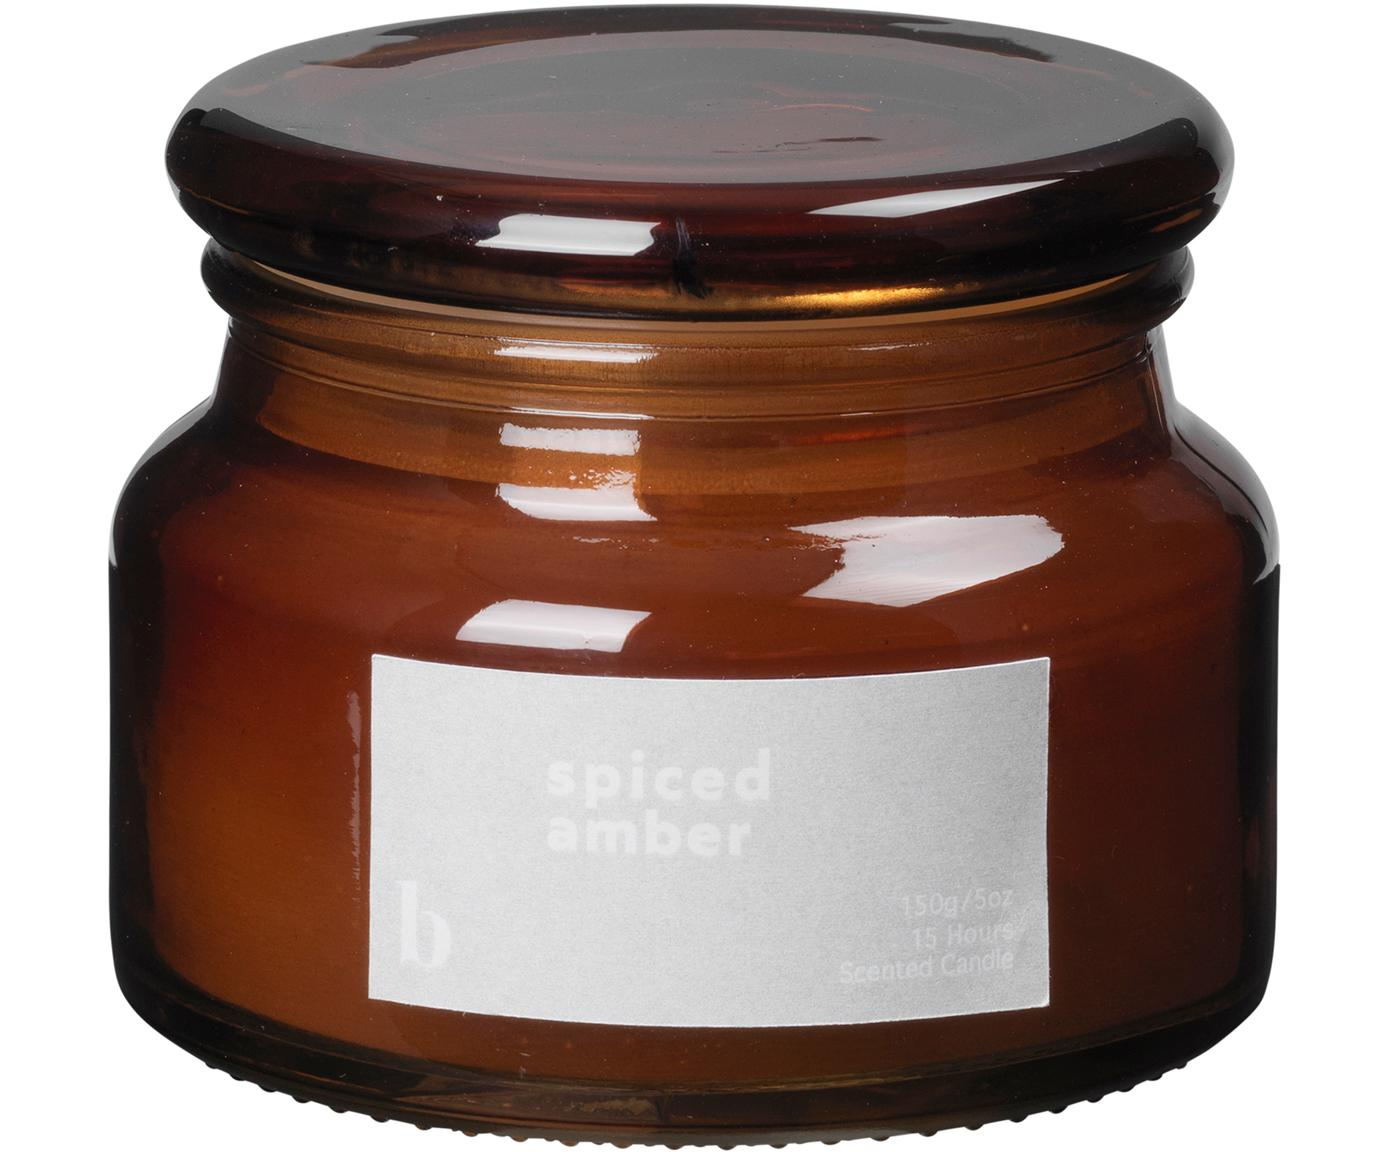 Geurkaars Spiced Amber, Houder: glas, Bruin, Ø 10 cm